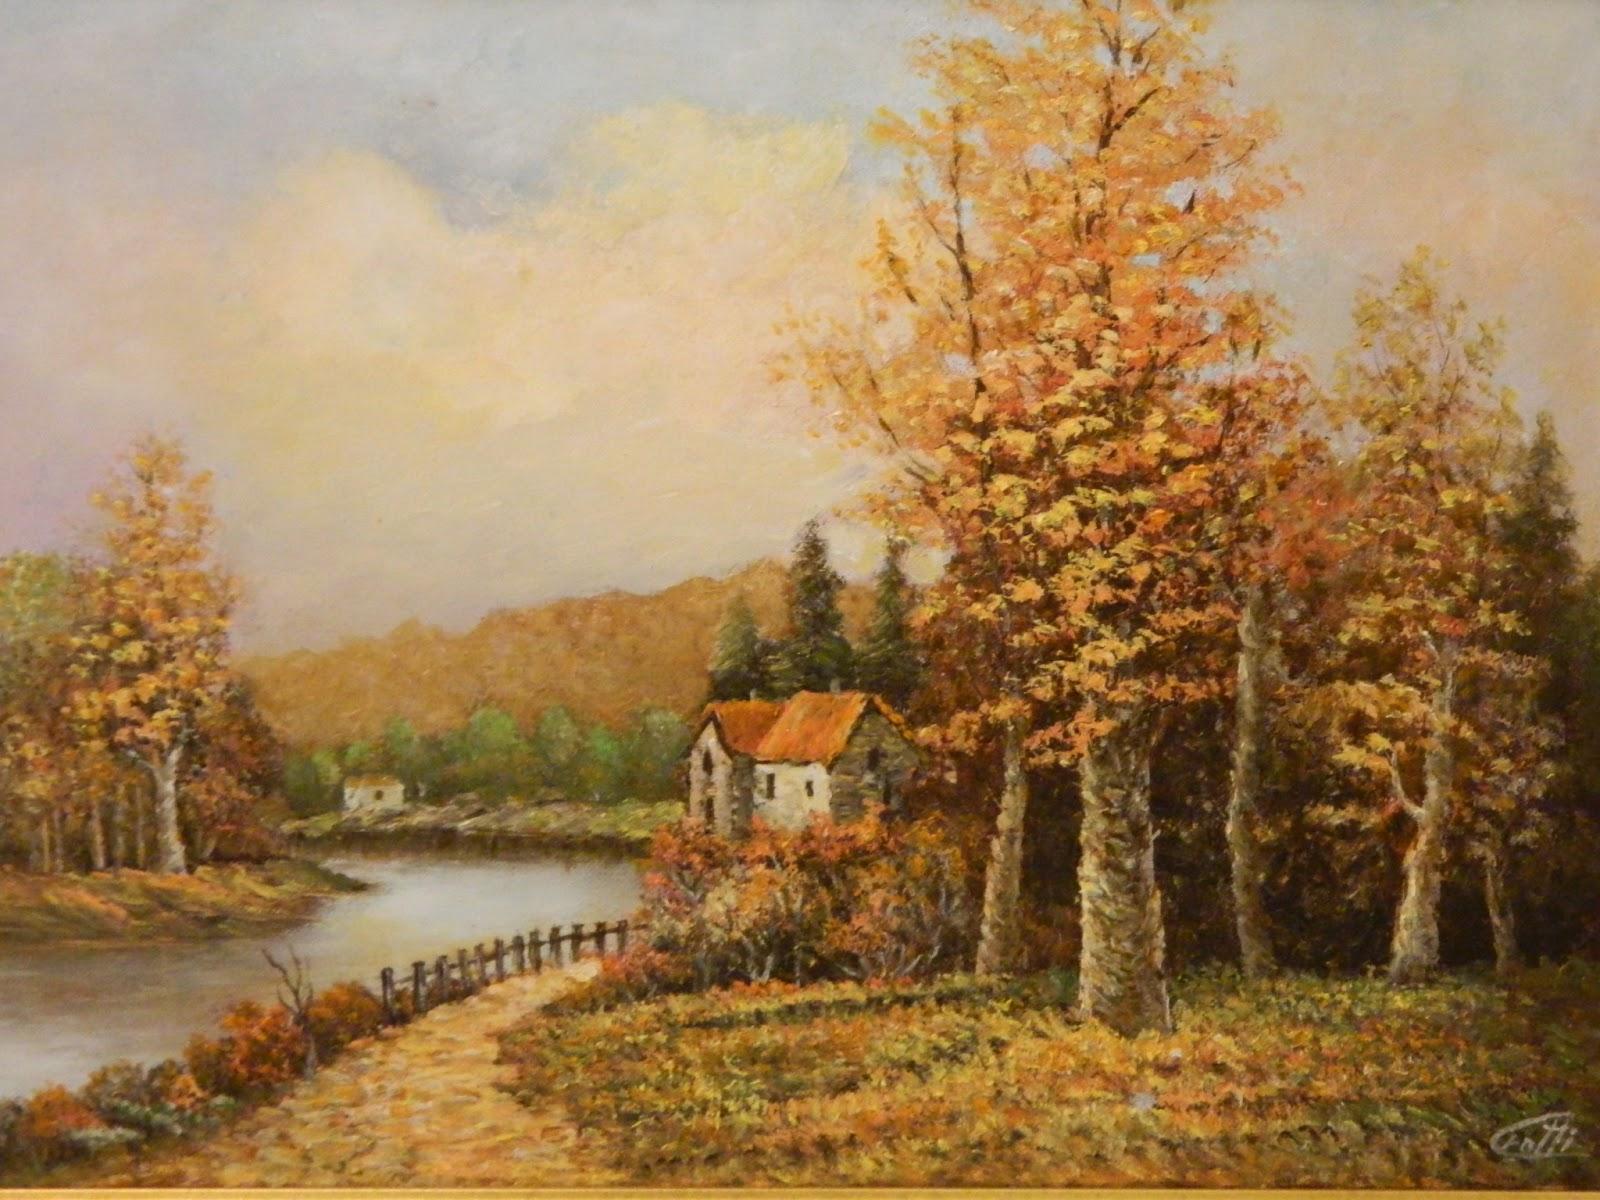 Immagini paesaggi autunnali for Disegni di cabina di campagna